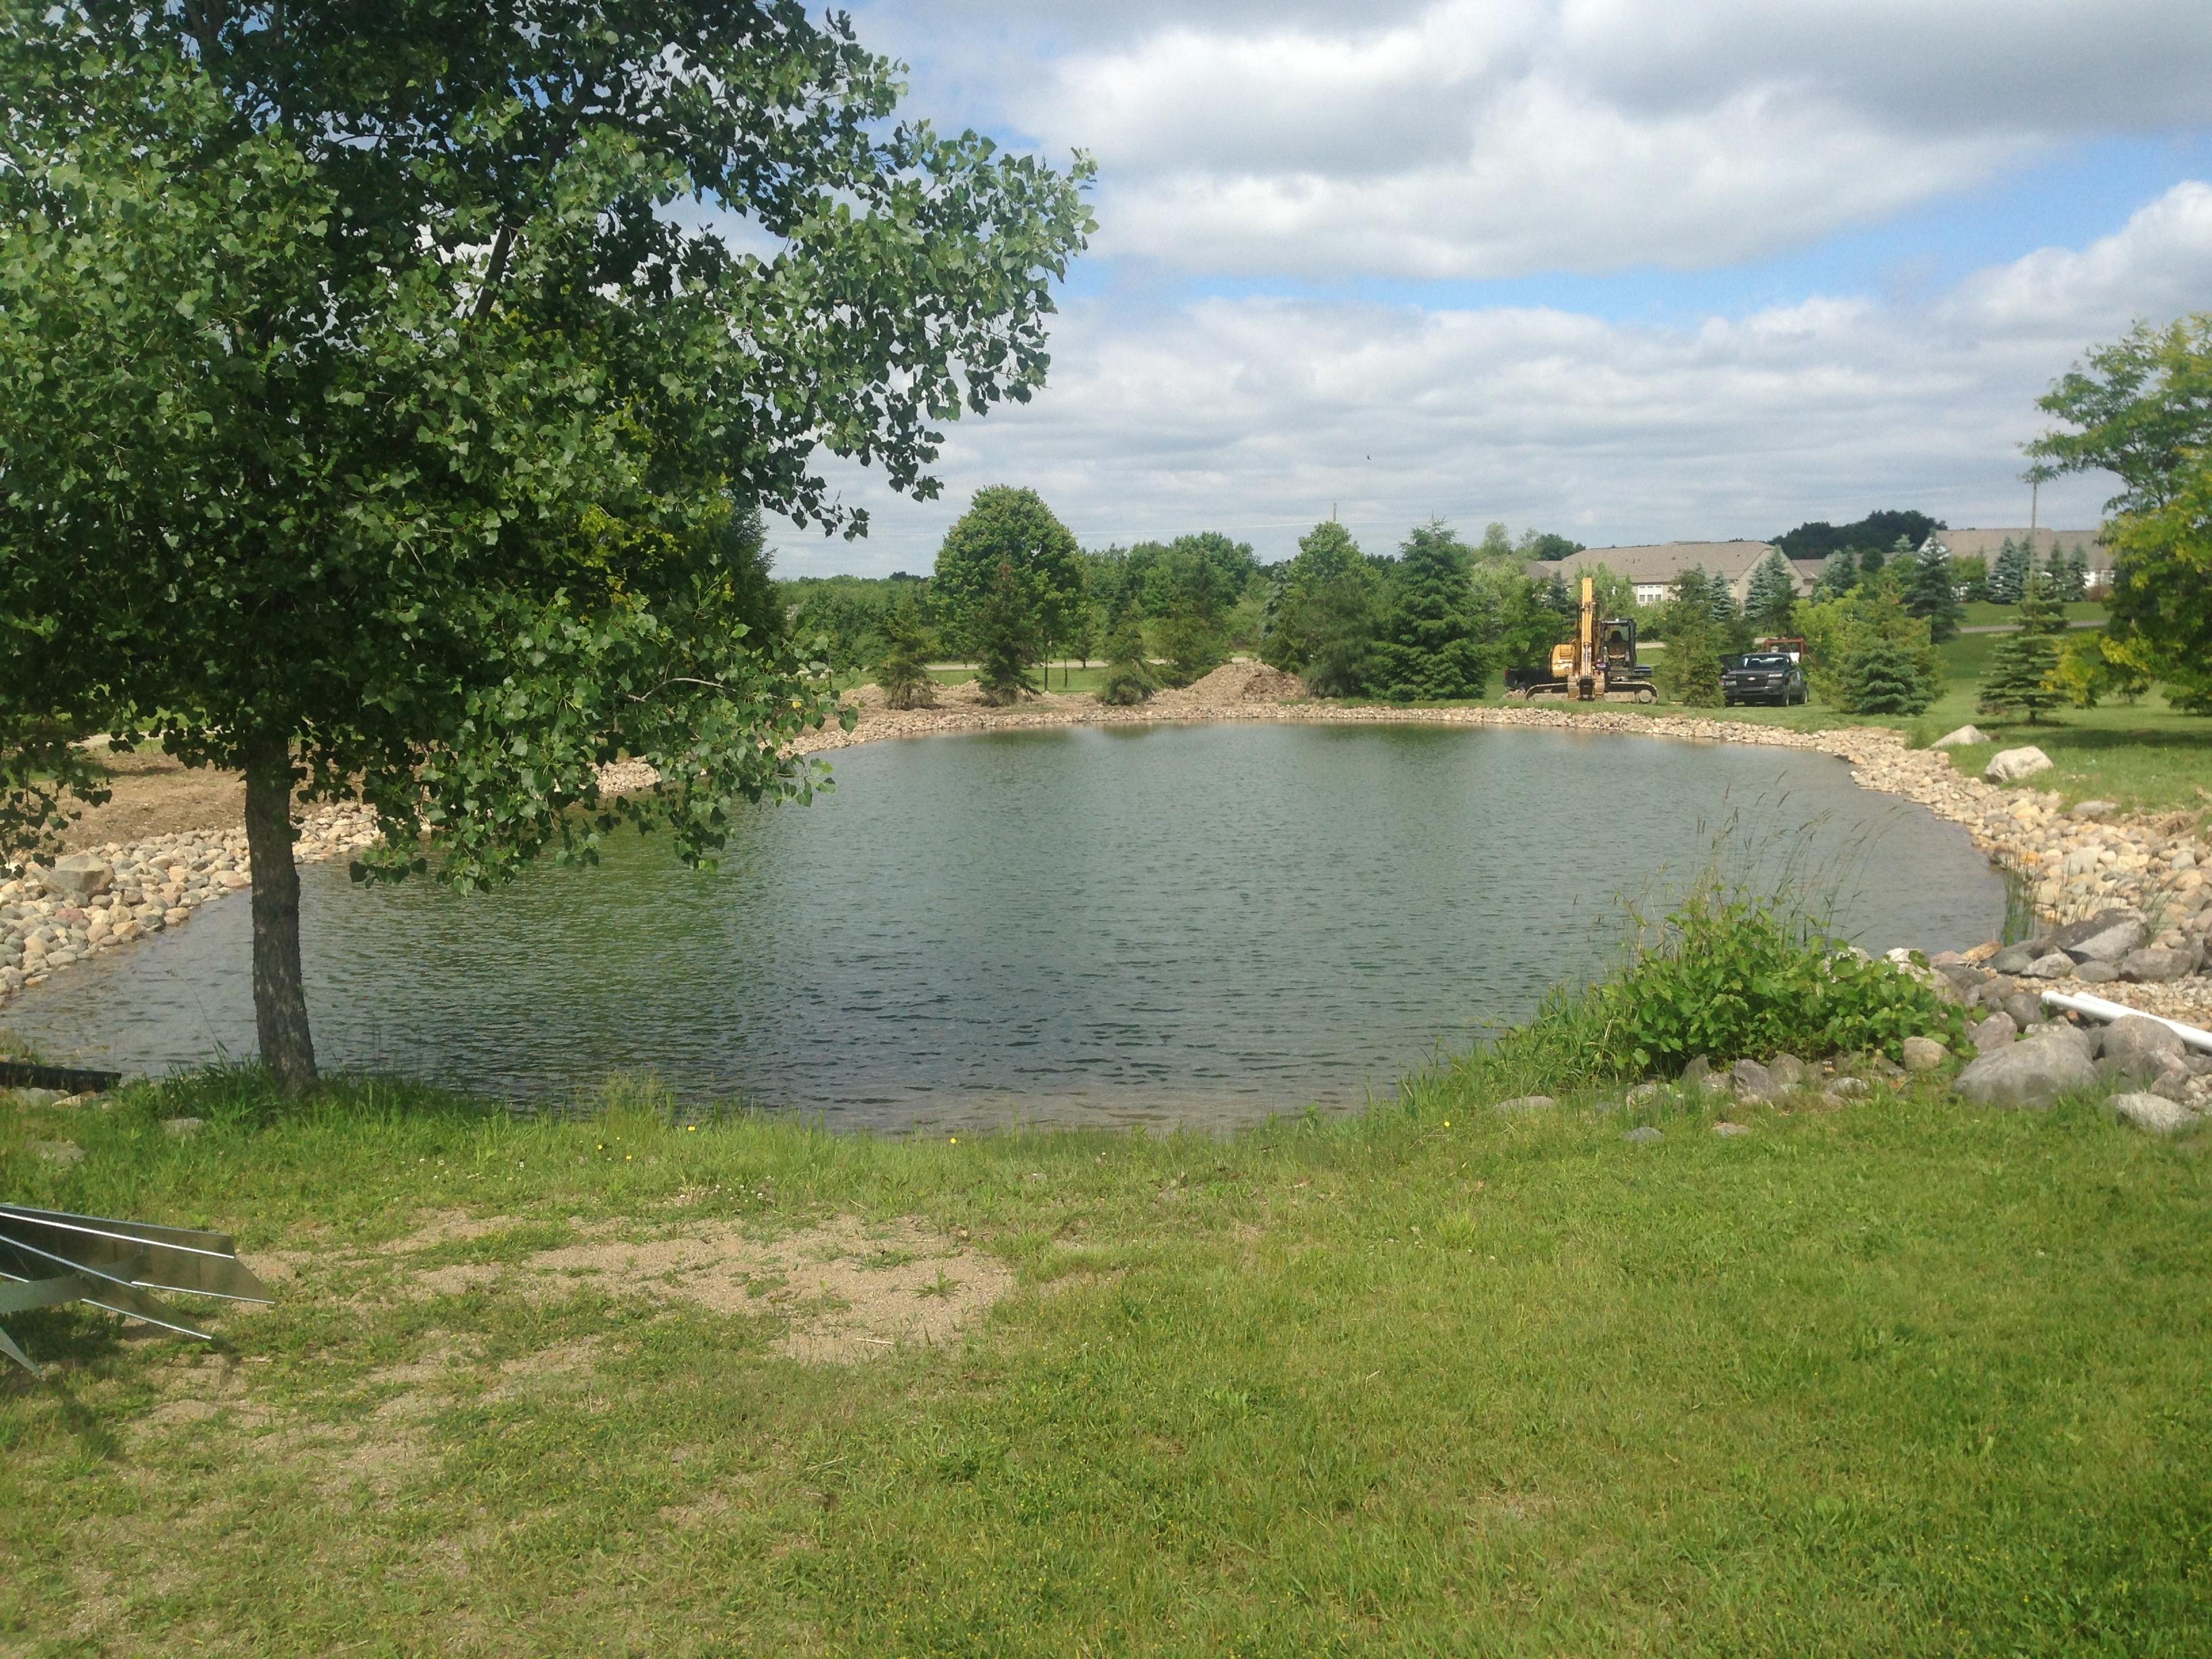 Pond_deepened_Howell_Michigan_13.jpg